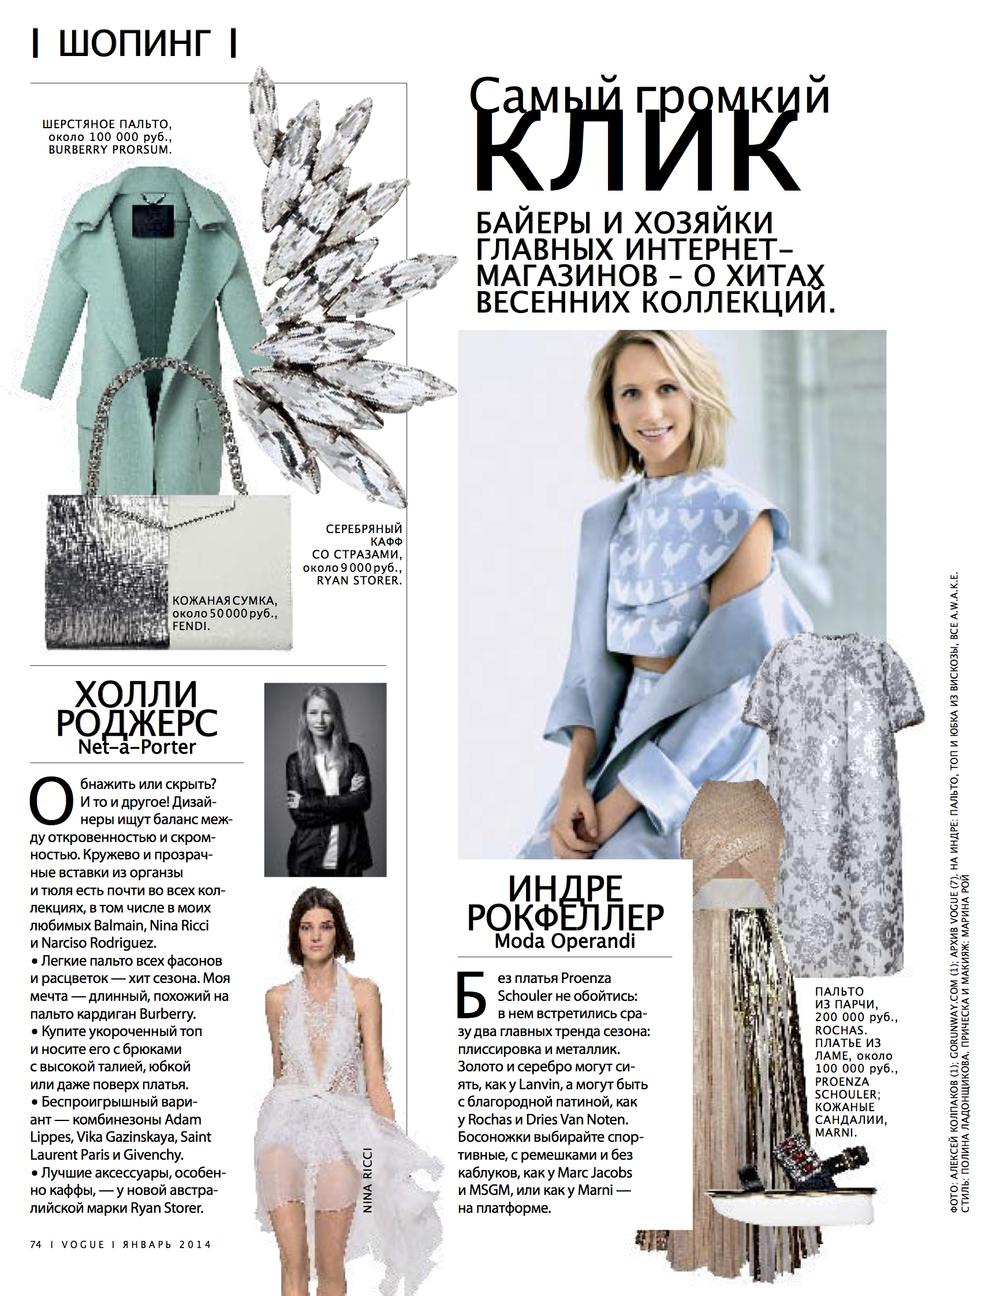 Vogue Russia, January 2014